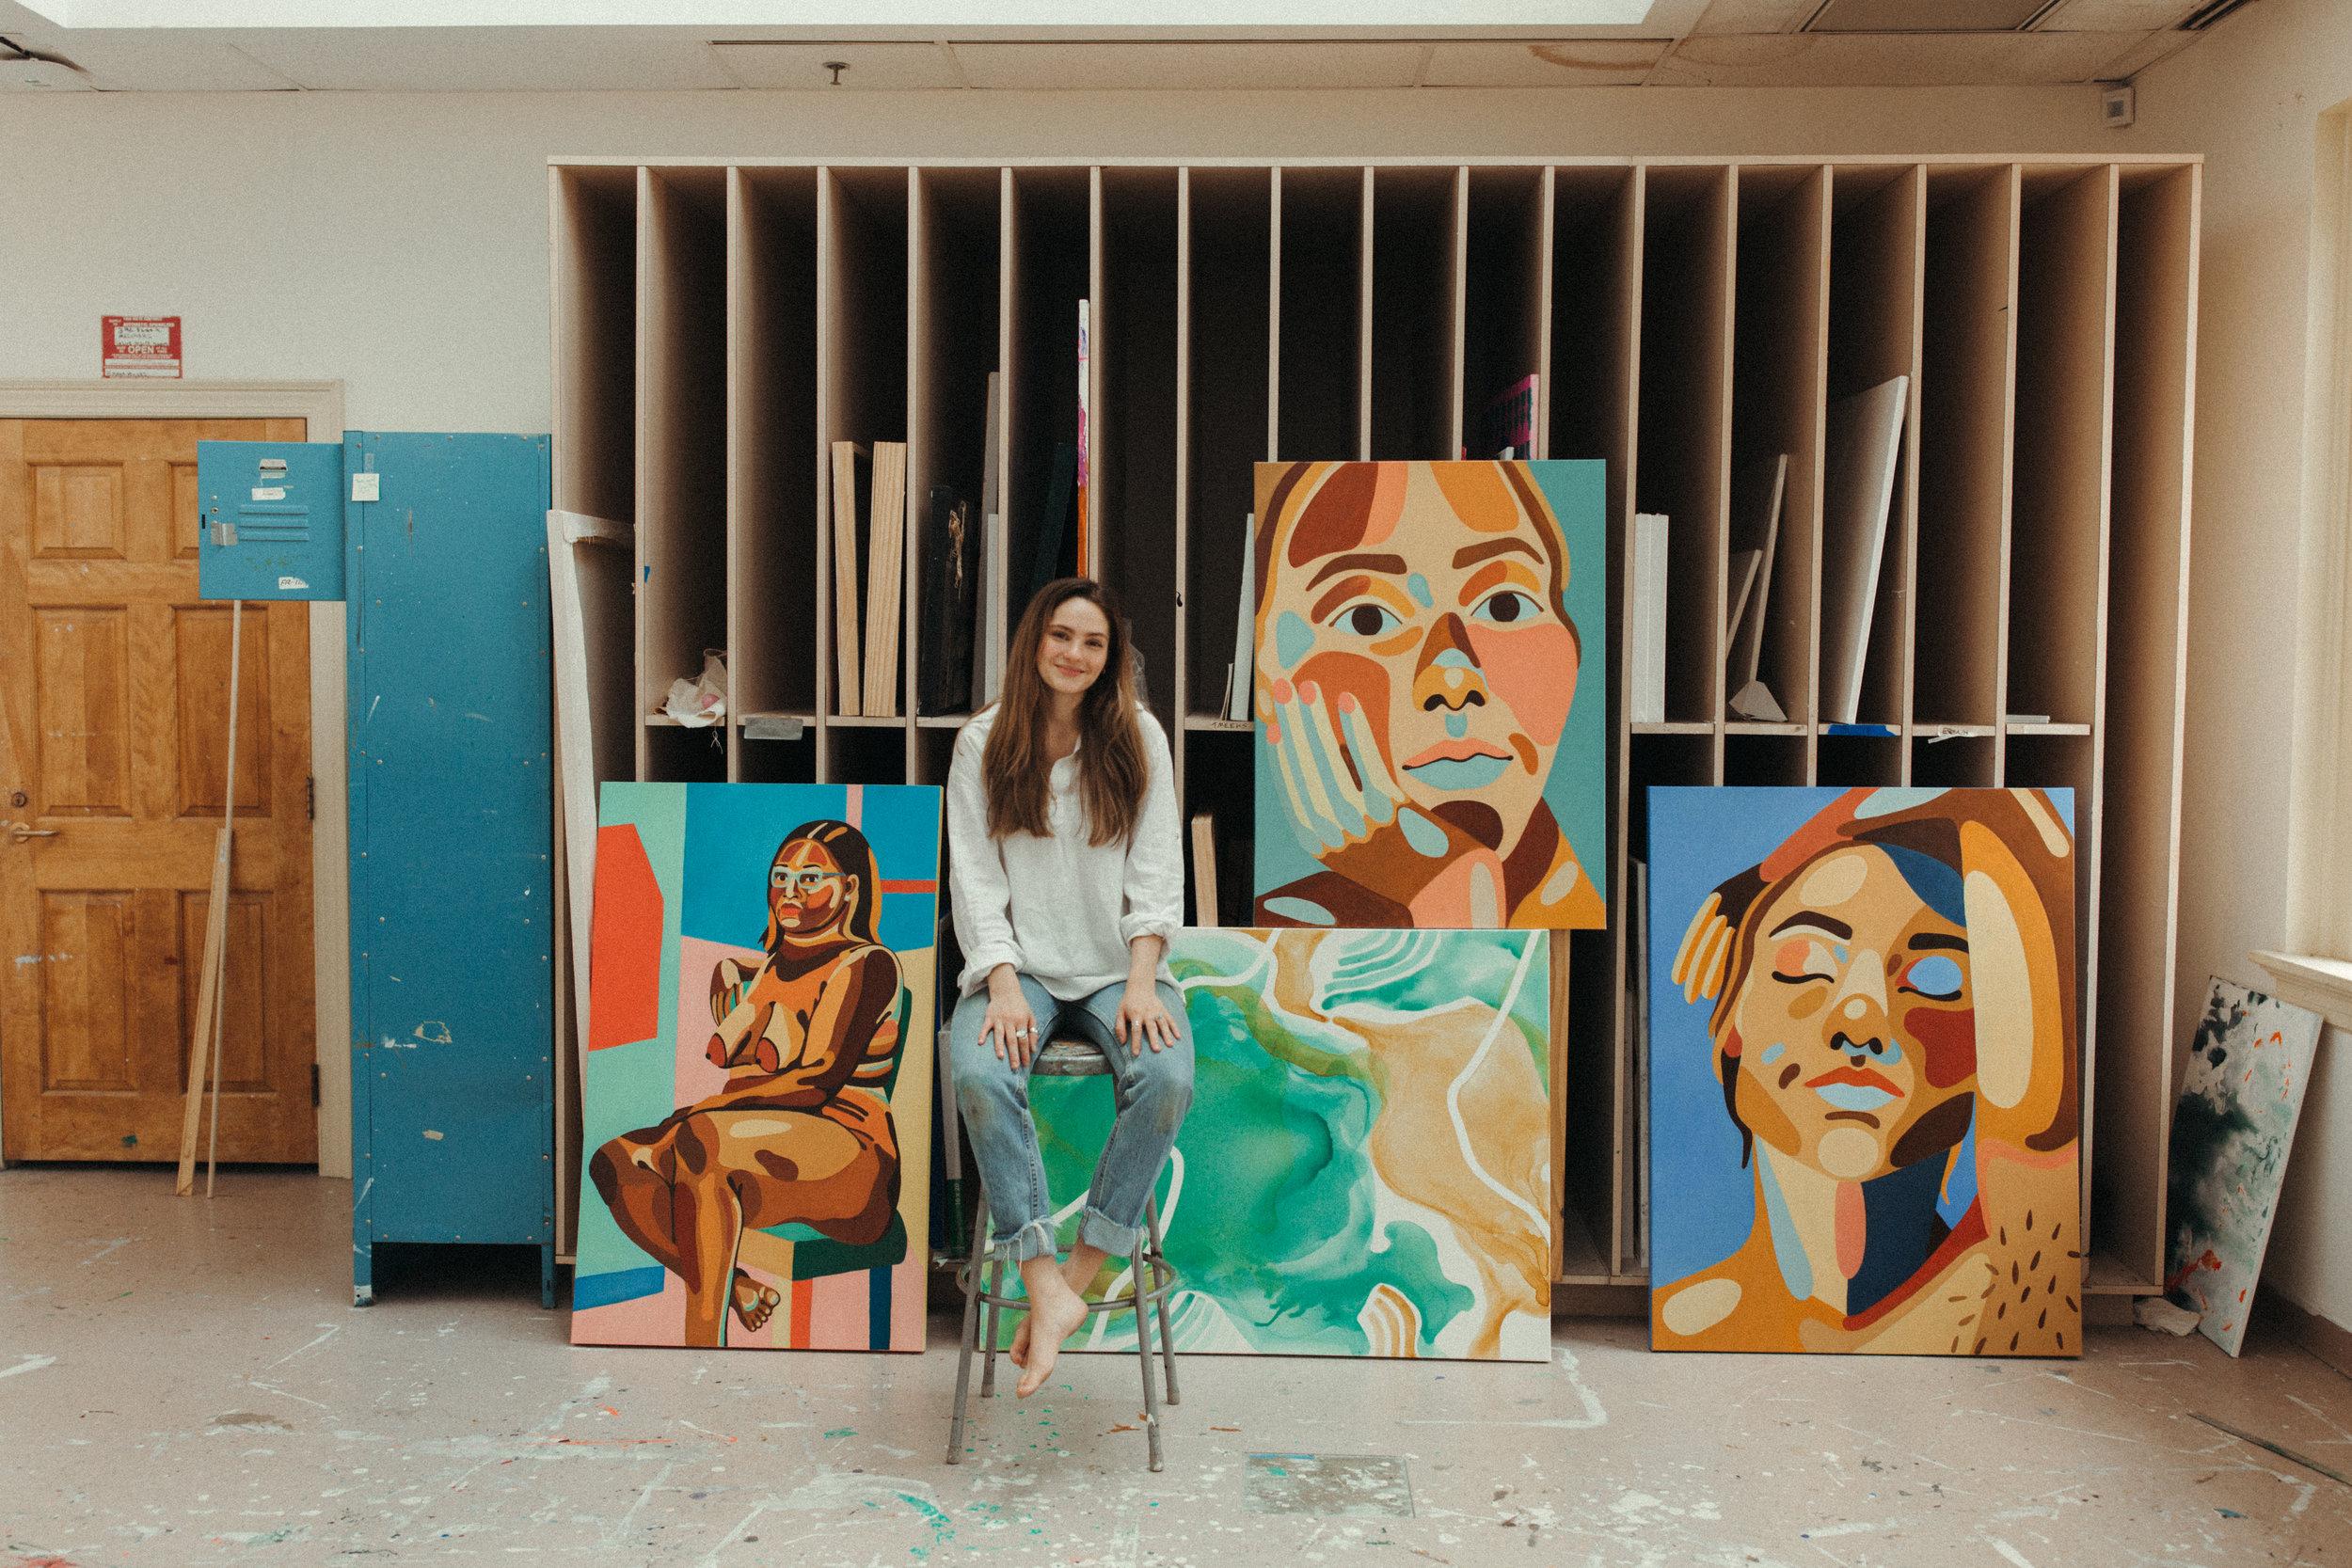 emily-pawlica-art-process-2019-peytoncurry-0745.jpg